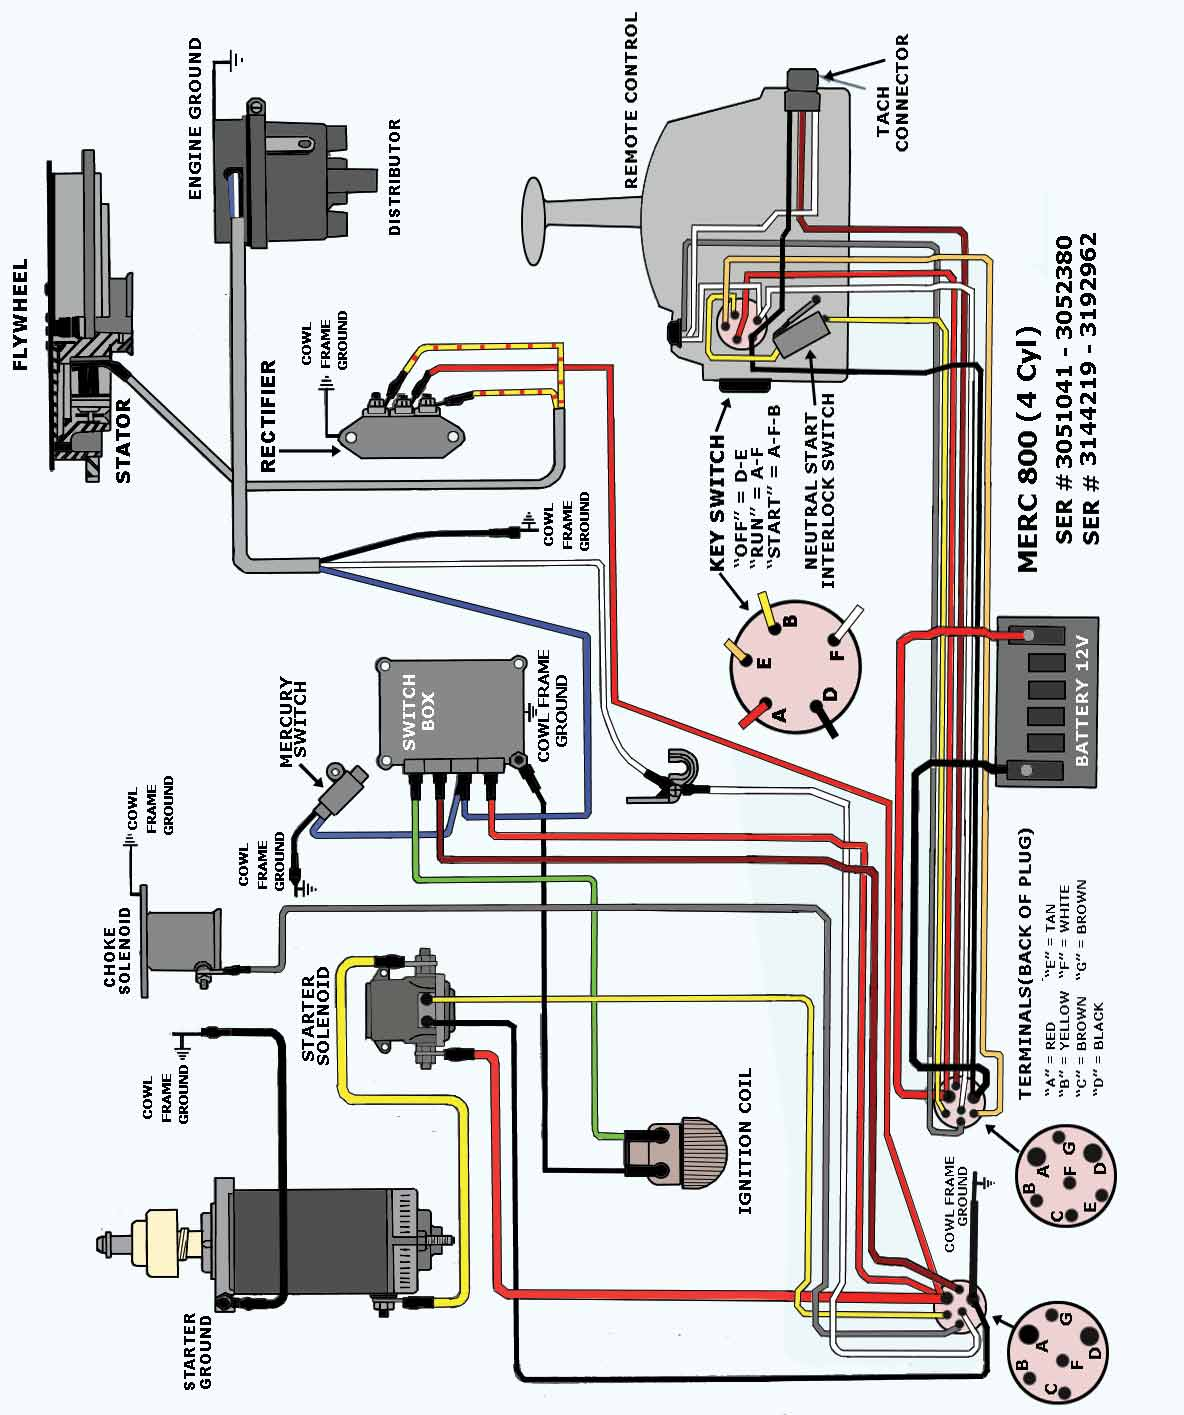 Fine Mercury Outboard Ignition Switch Wiring Diagram Wiring Diagram M6 Wiring Cloud Licukosporaidewilluminateatxorg